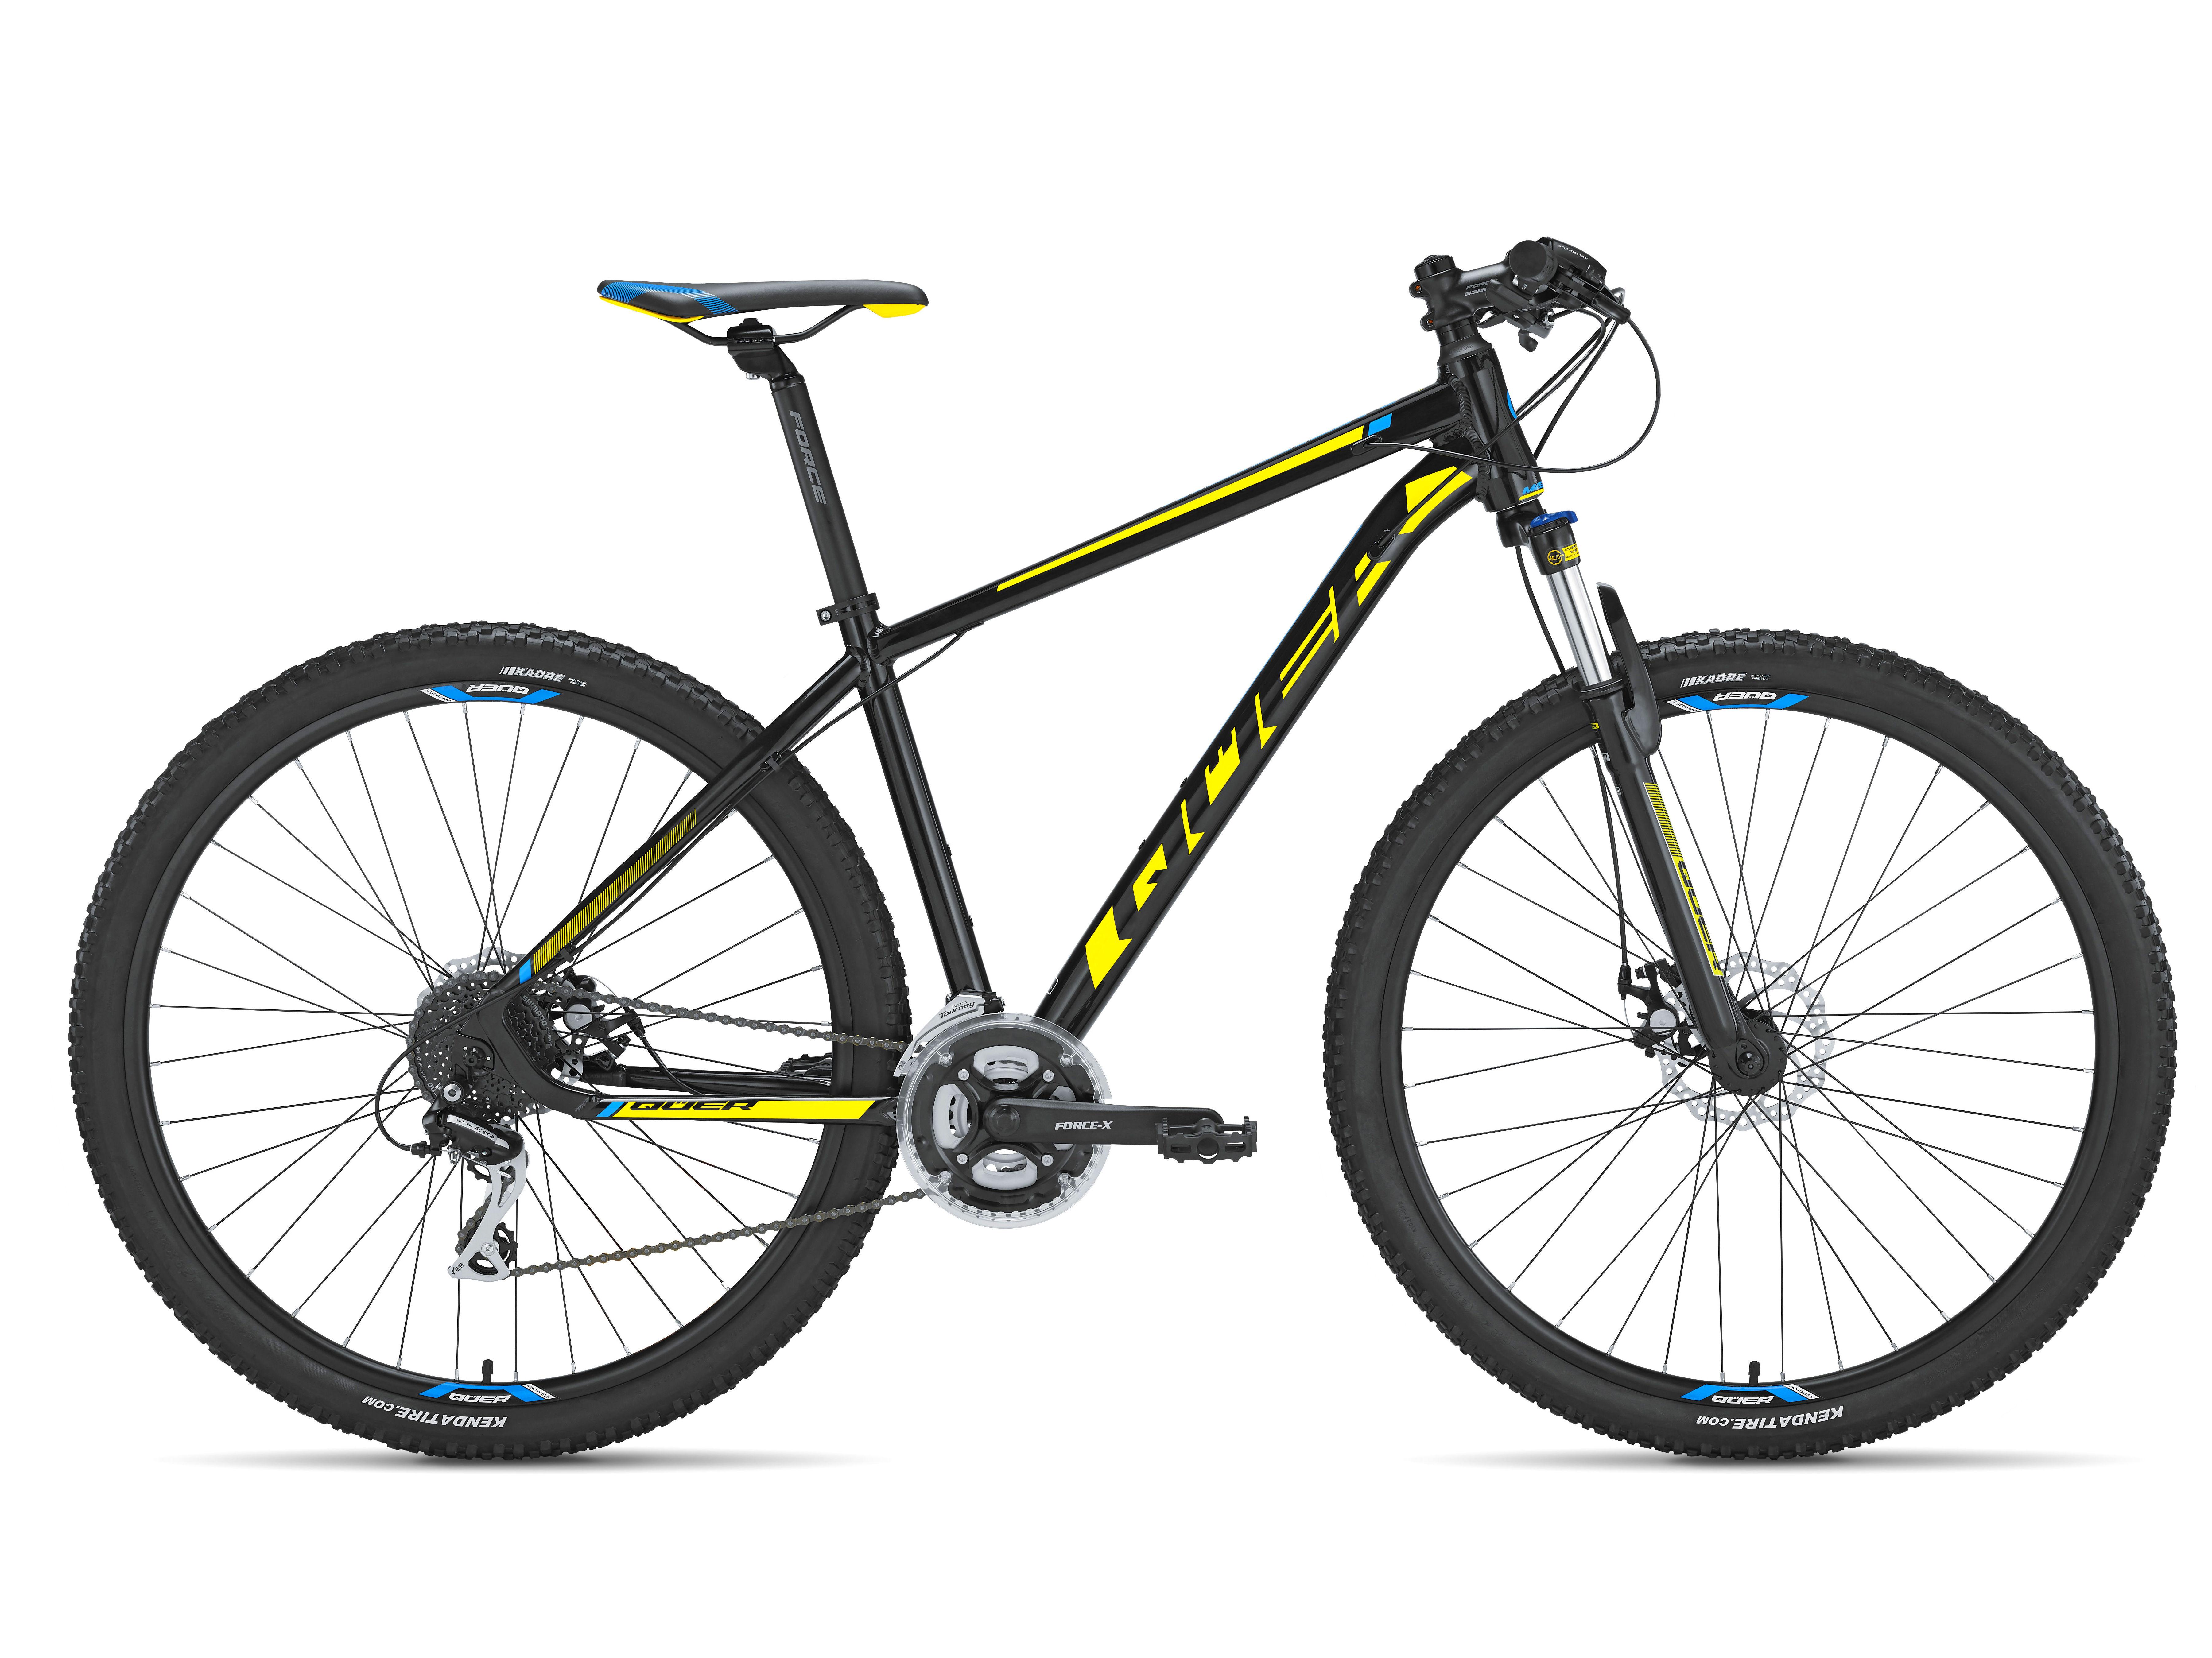 MISSION 29 5: Productos de Ciclos Queralt